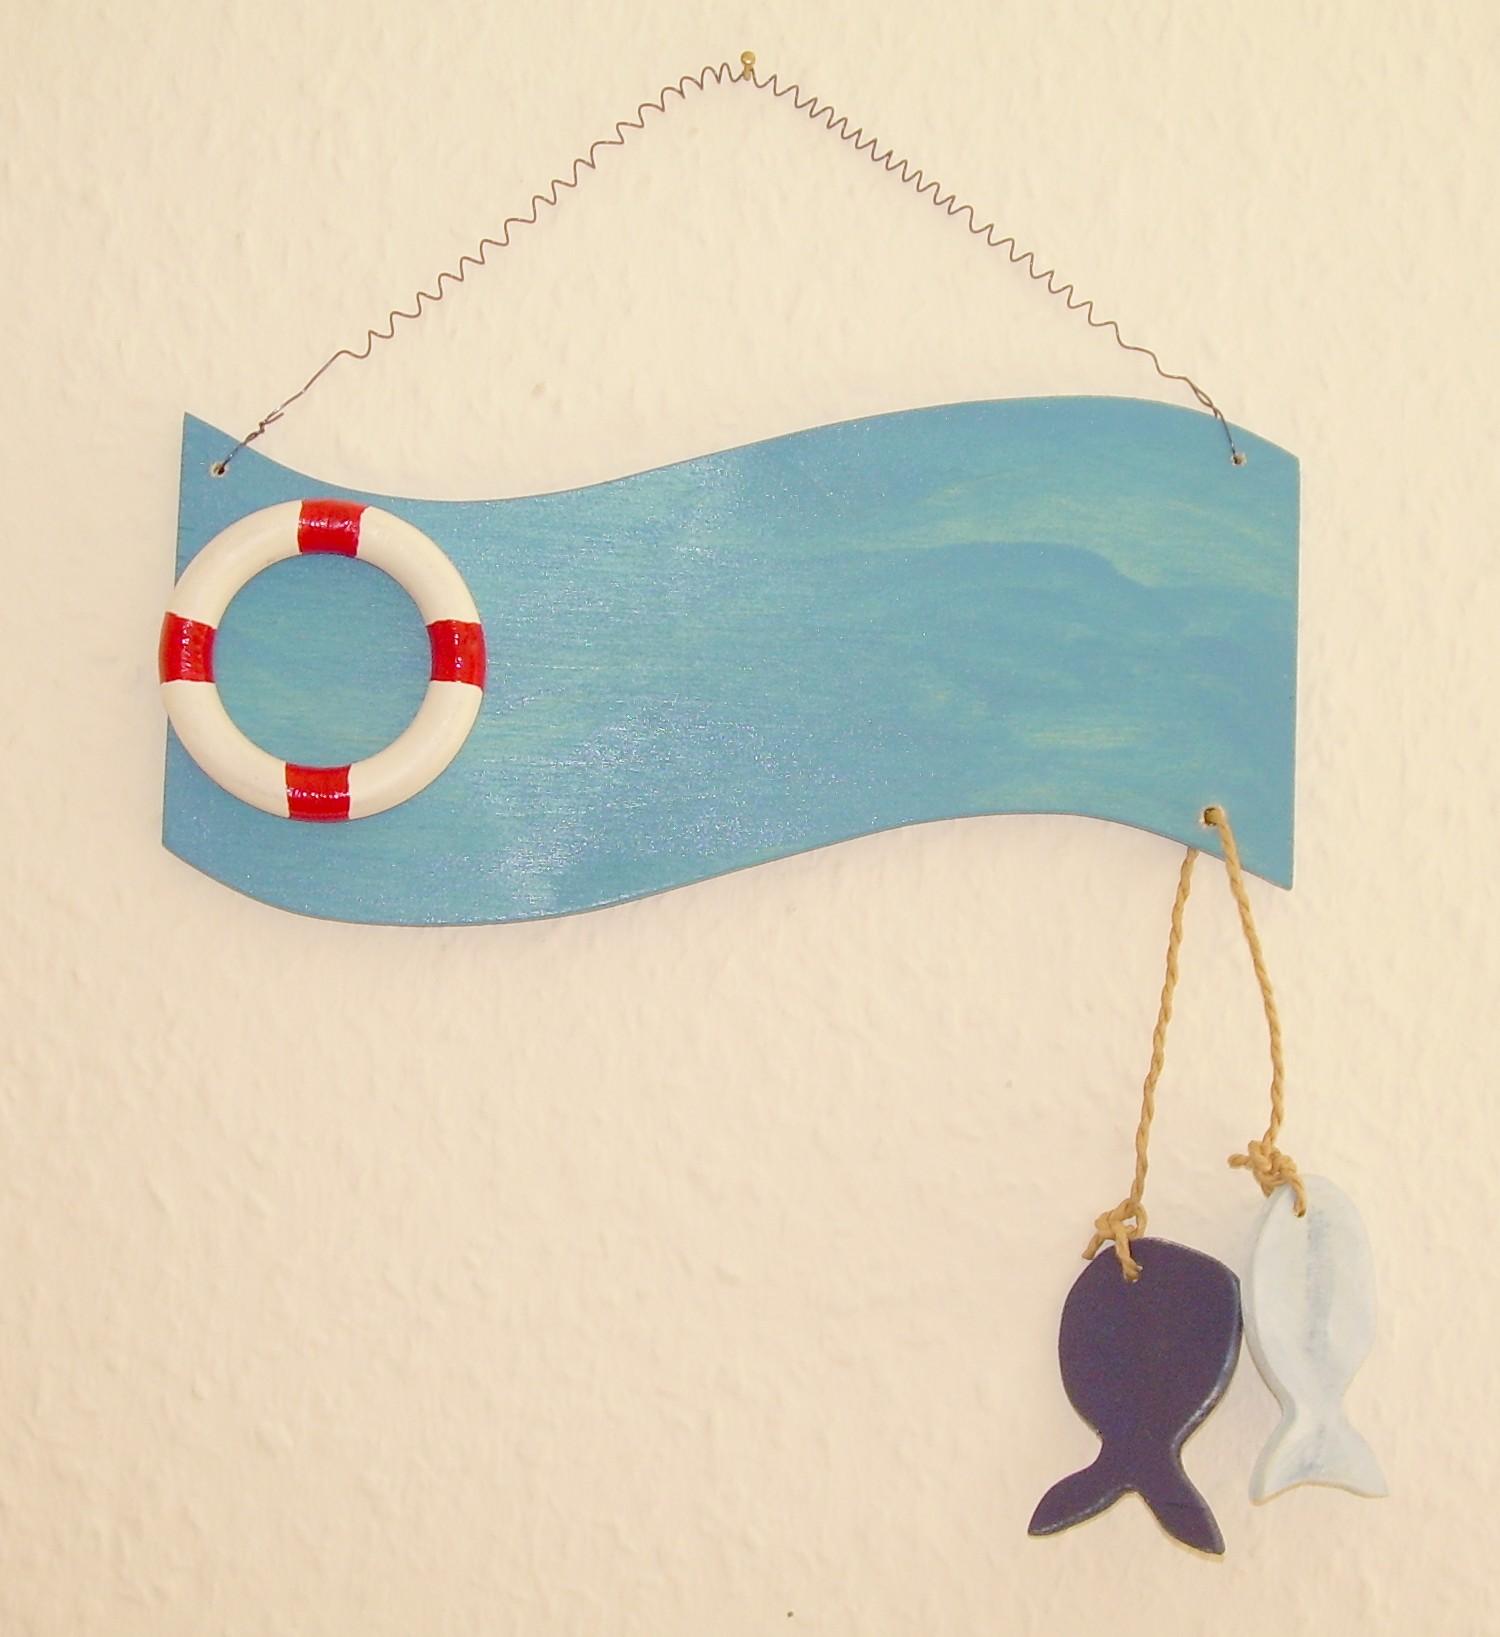 maritimes schild originelle deko geschenke. Black Bedroom Furniture Sets. Home Design Ideas